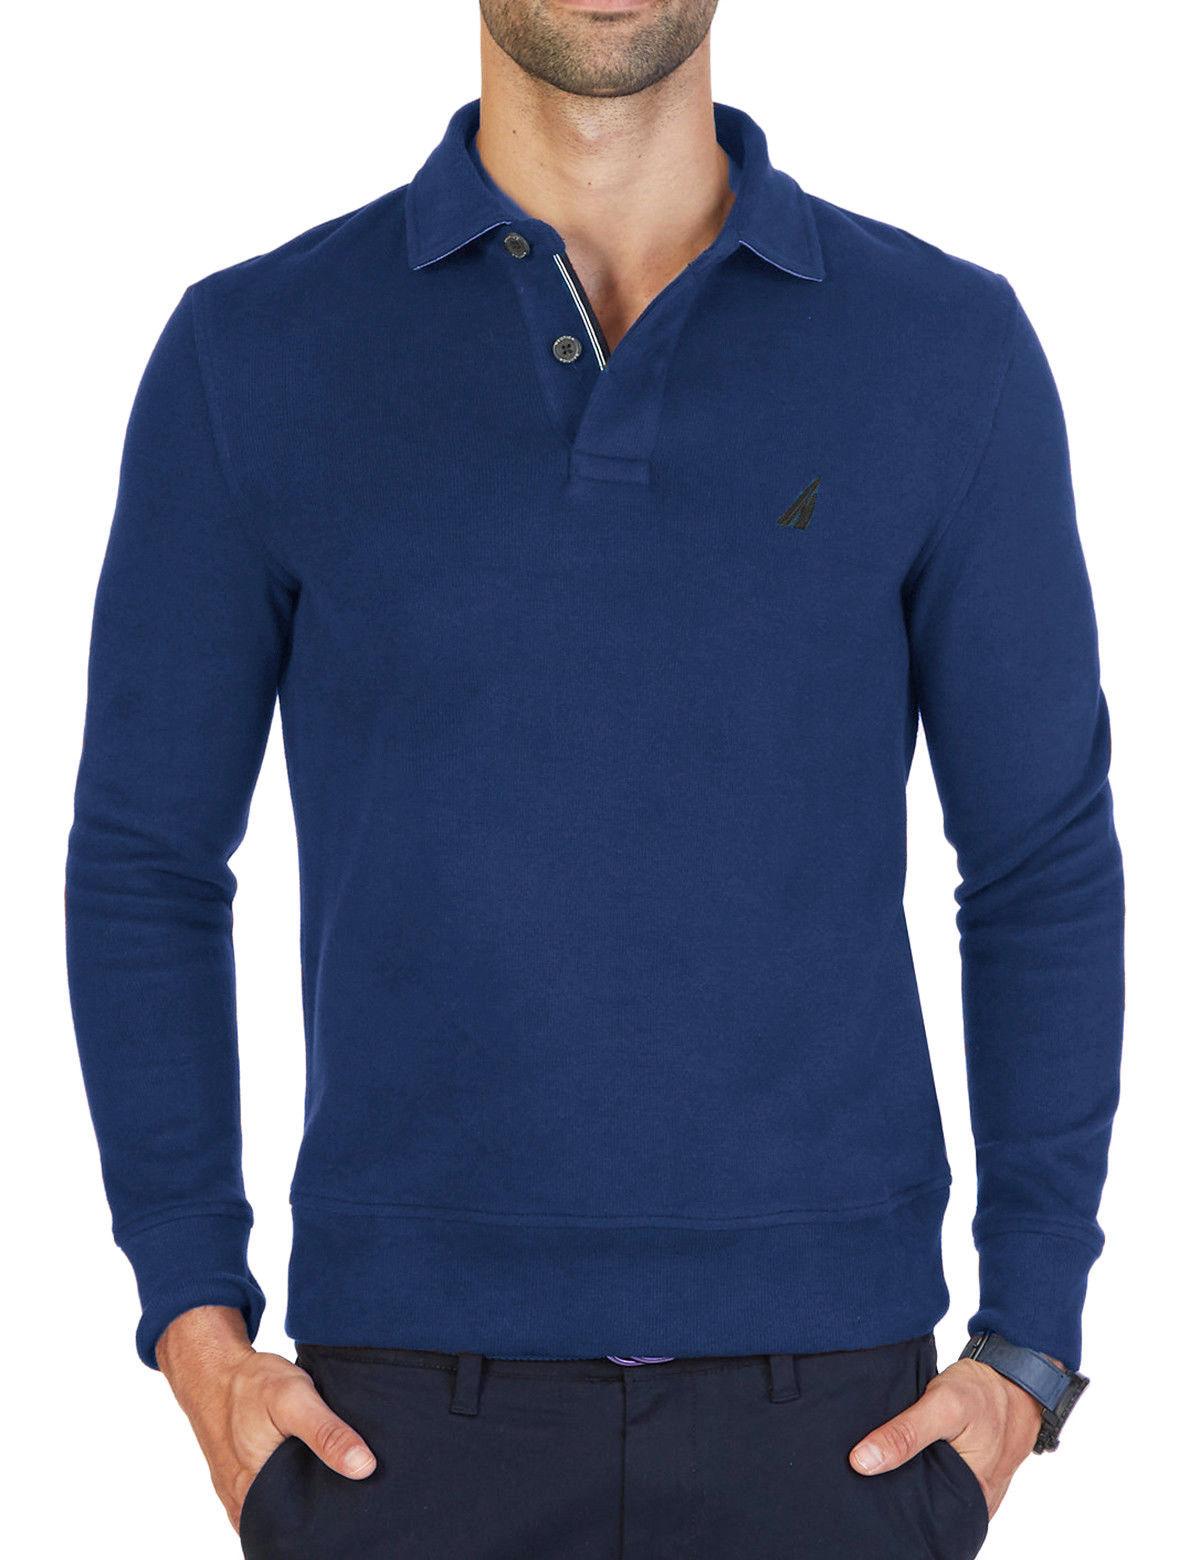 NEW MENS NAUTICA WINDWARD LONG SLEEVE BLUE CLASSIC FIT FRENCH RIB POLO XXL $79 - $28.99